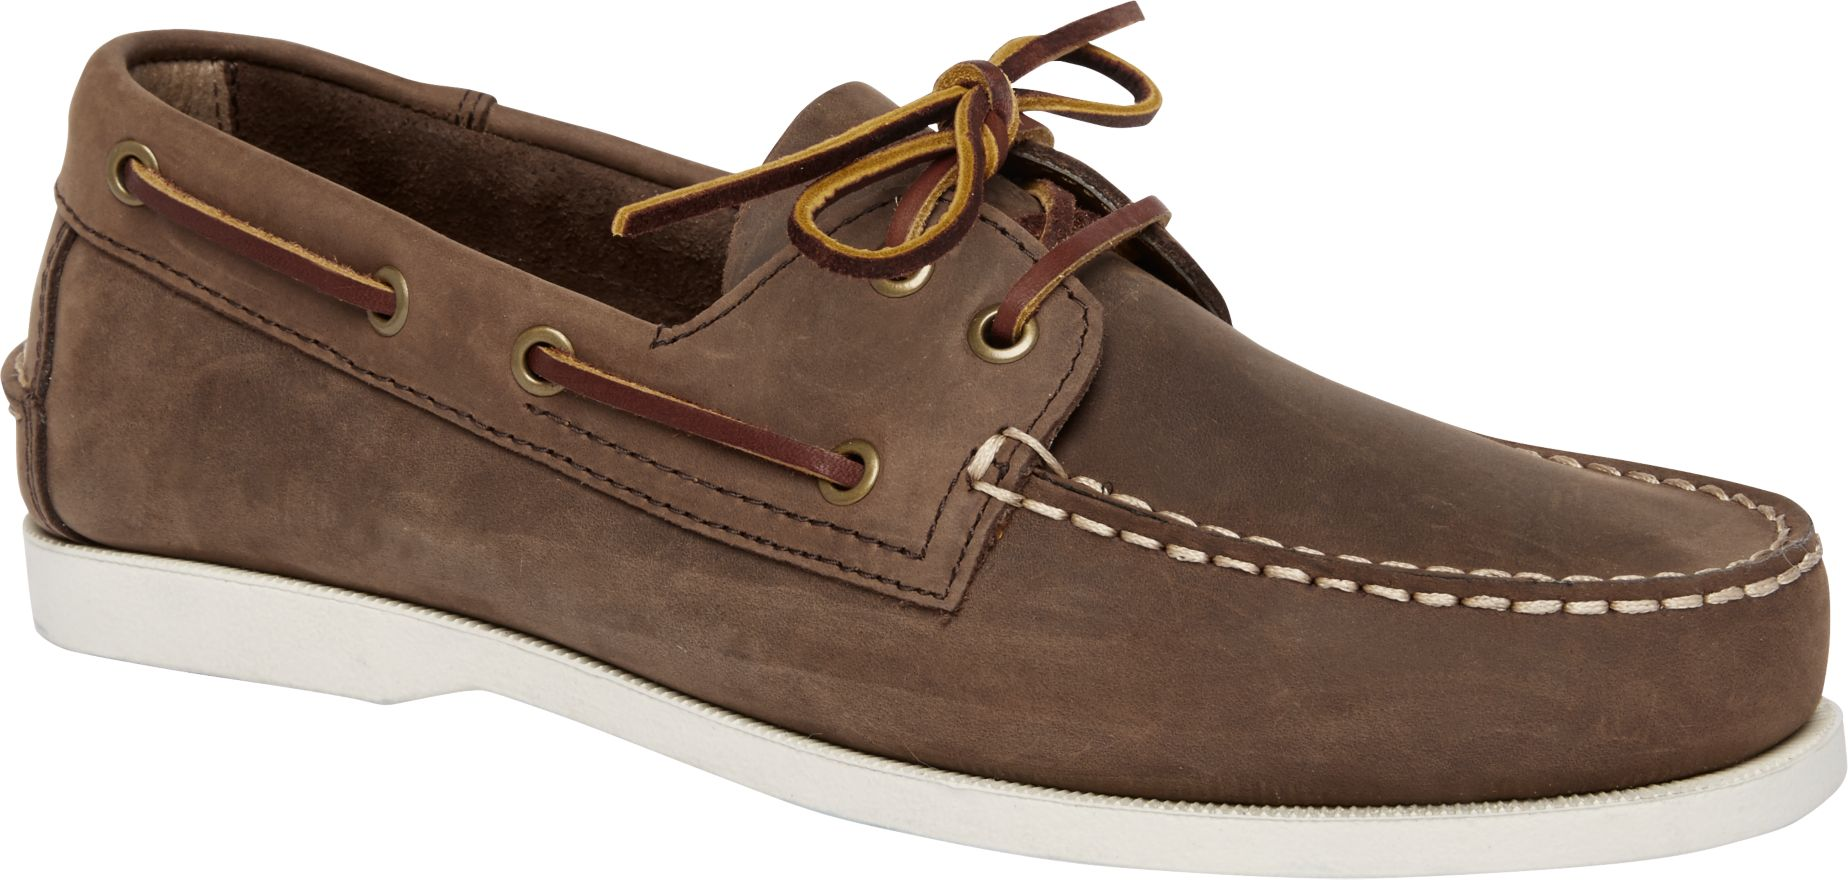 Olukai Womens Boat Shoes